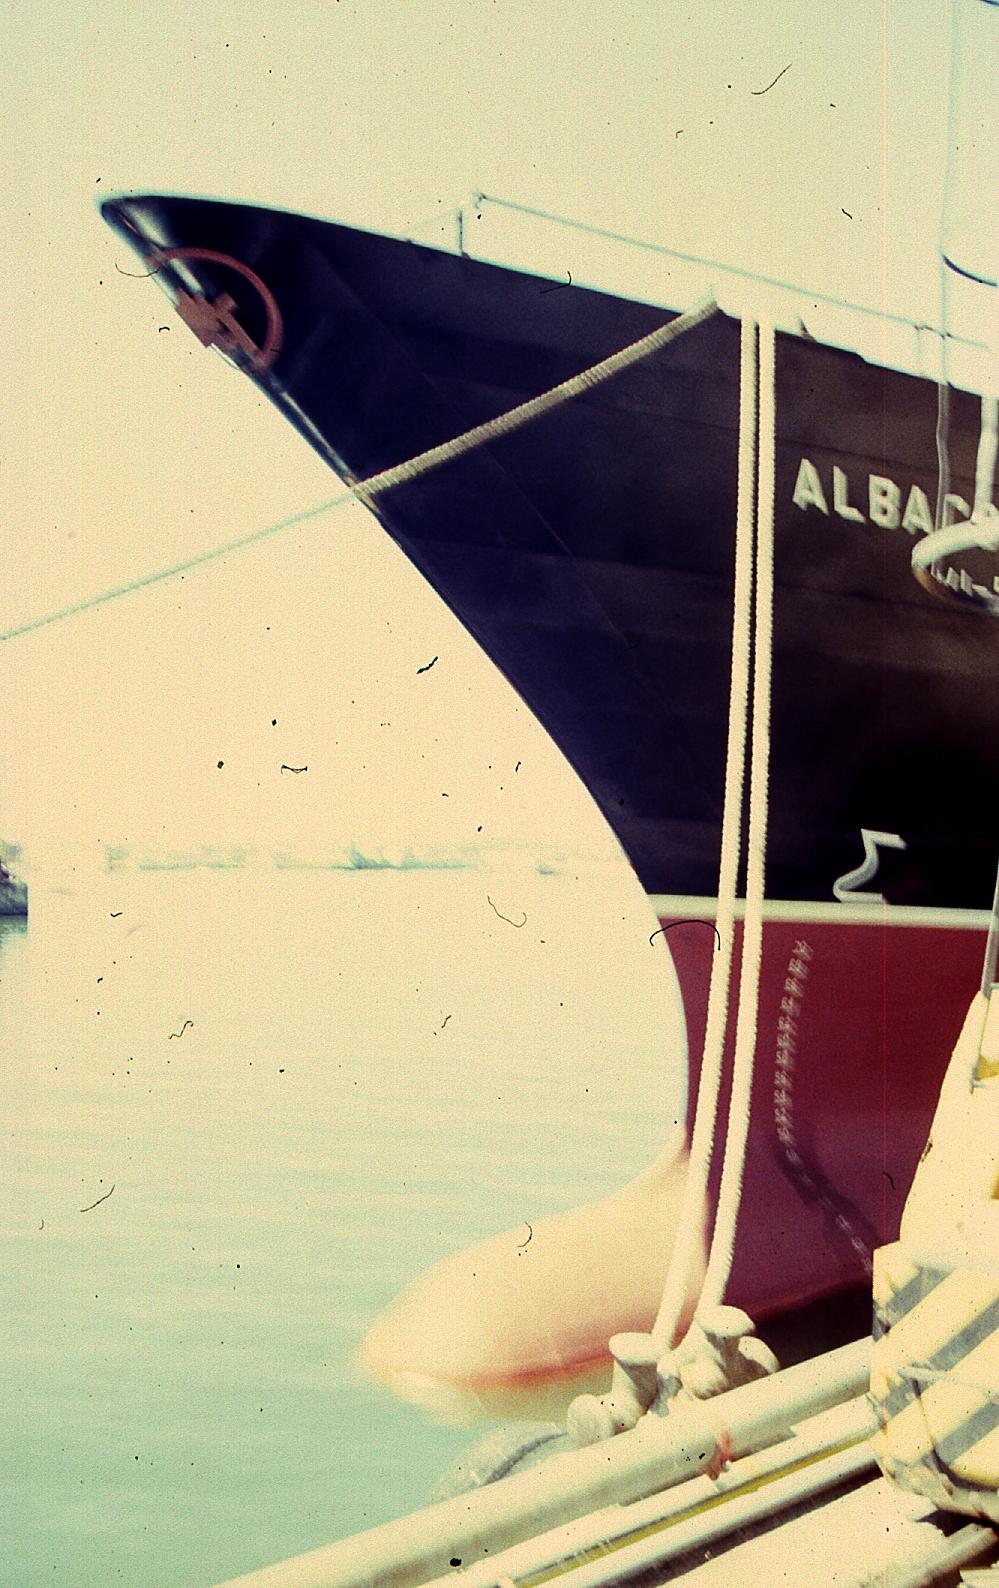 ALBACORA IV022.jpg